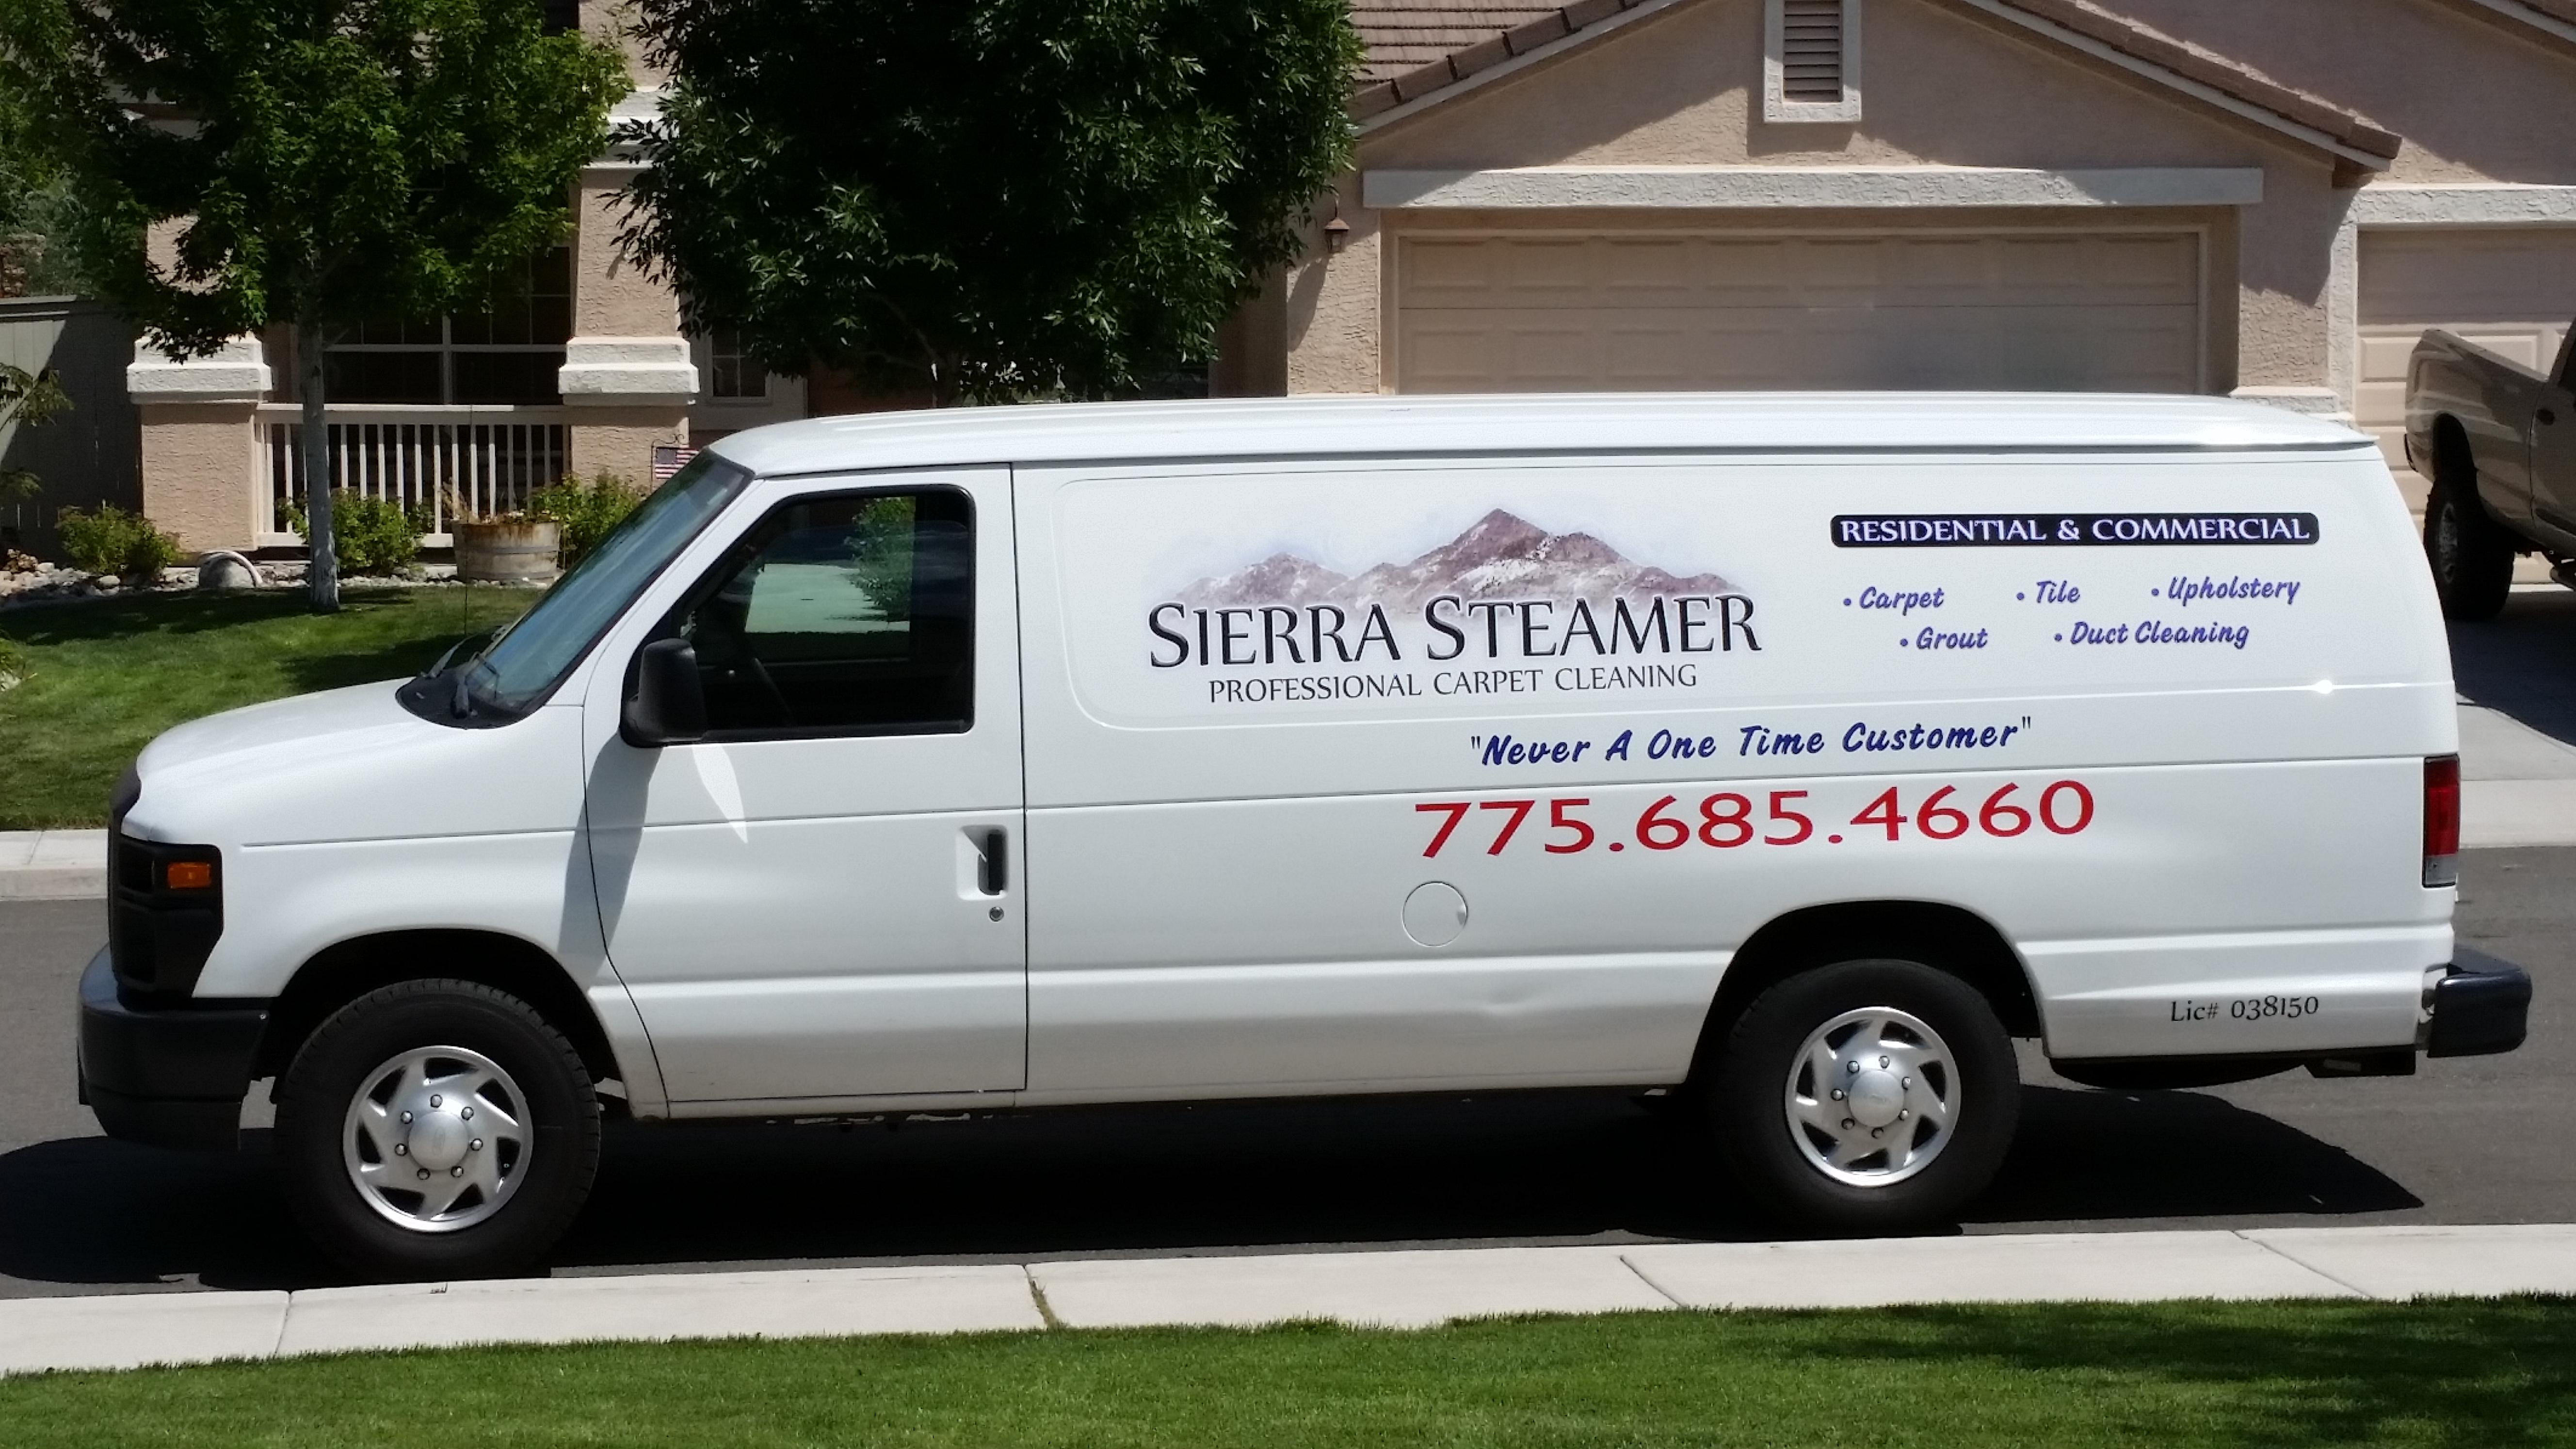 Sierra Steamer image 1